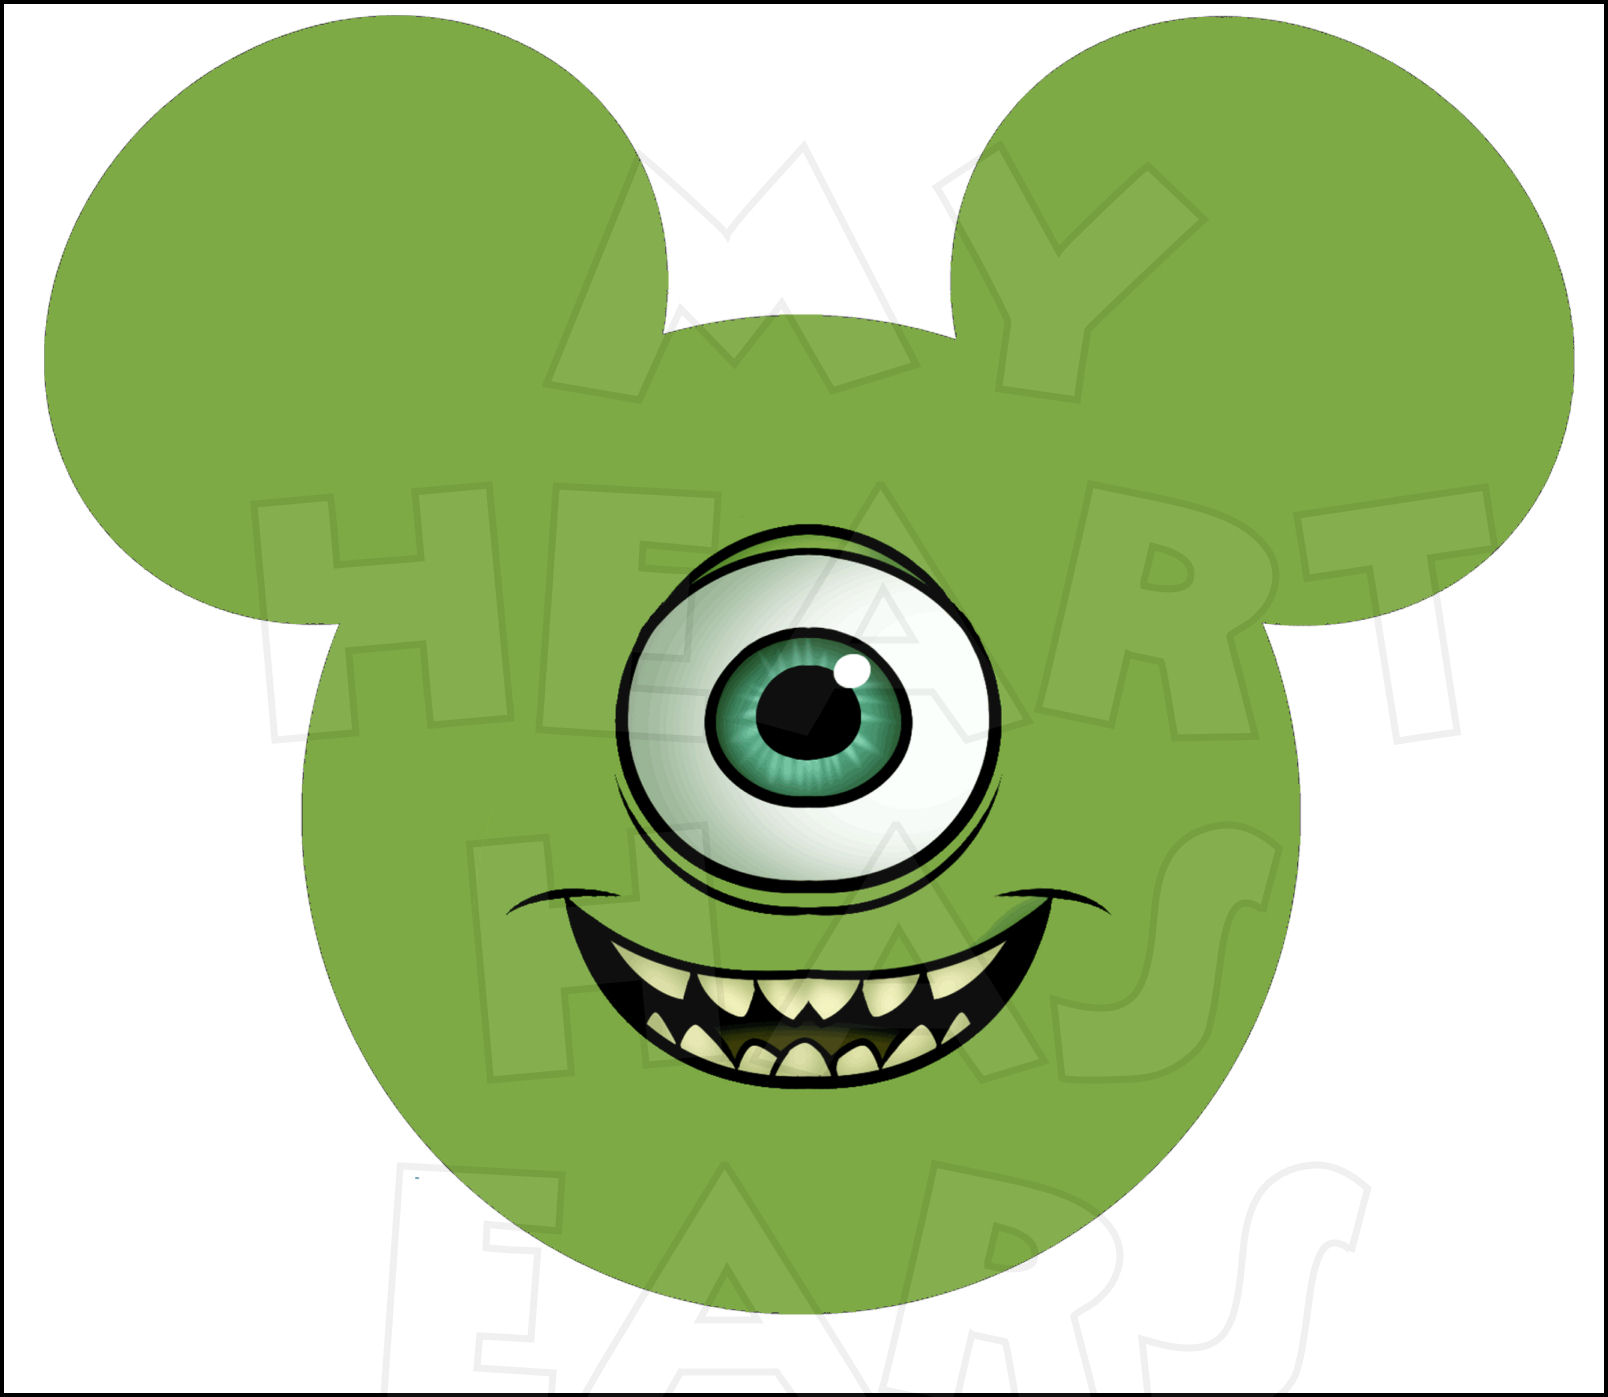 1608x1397 Monsters Inc. My Heart Has Ears